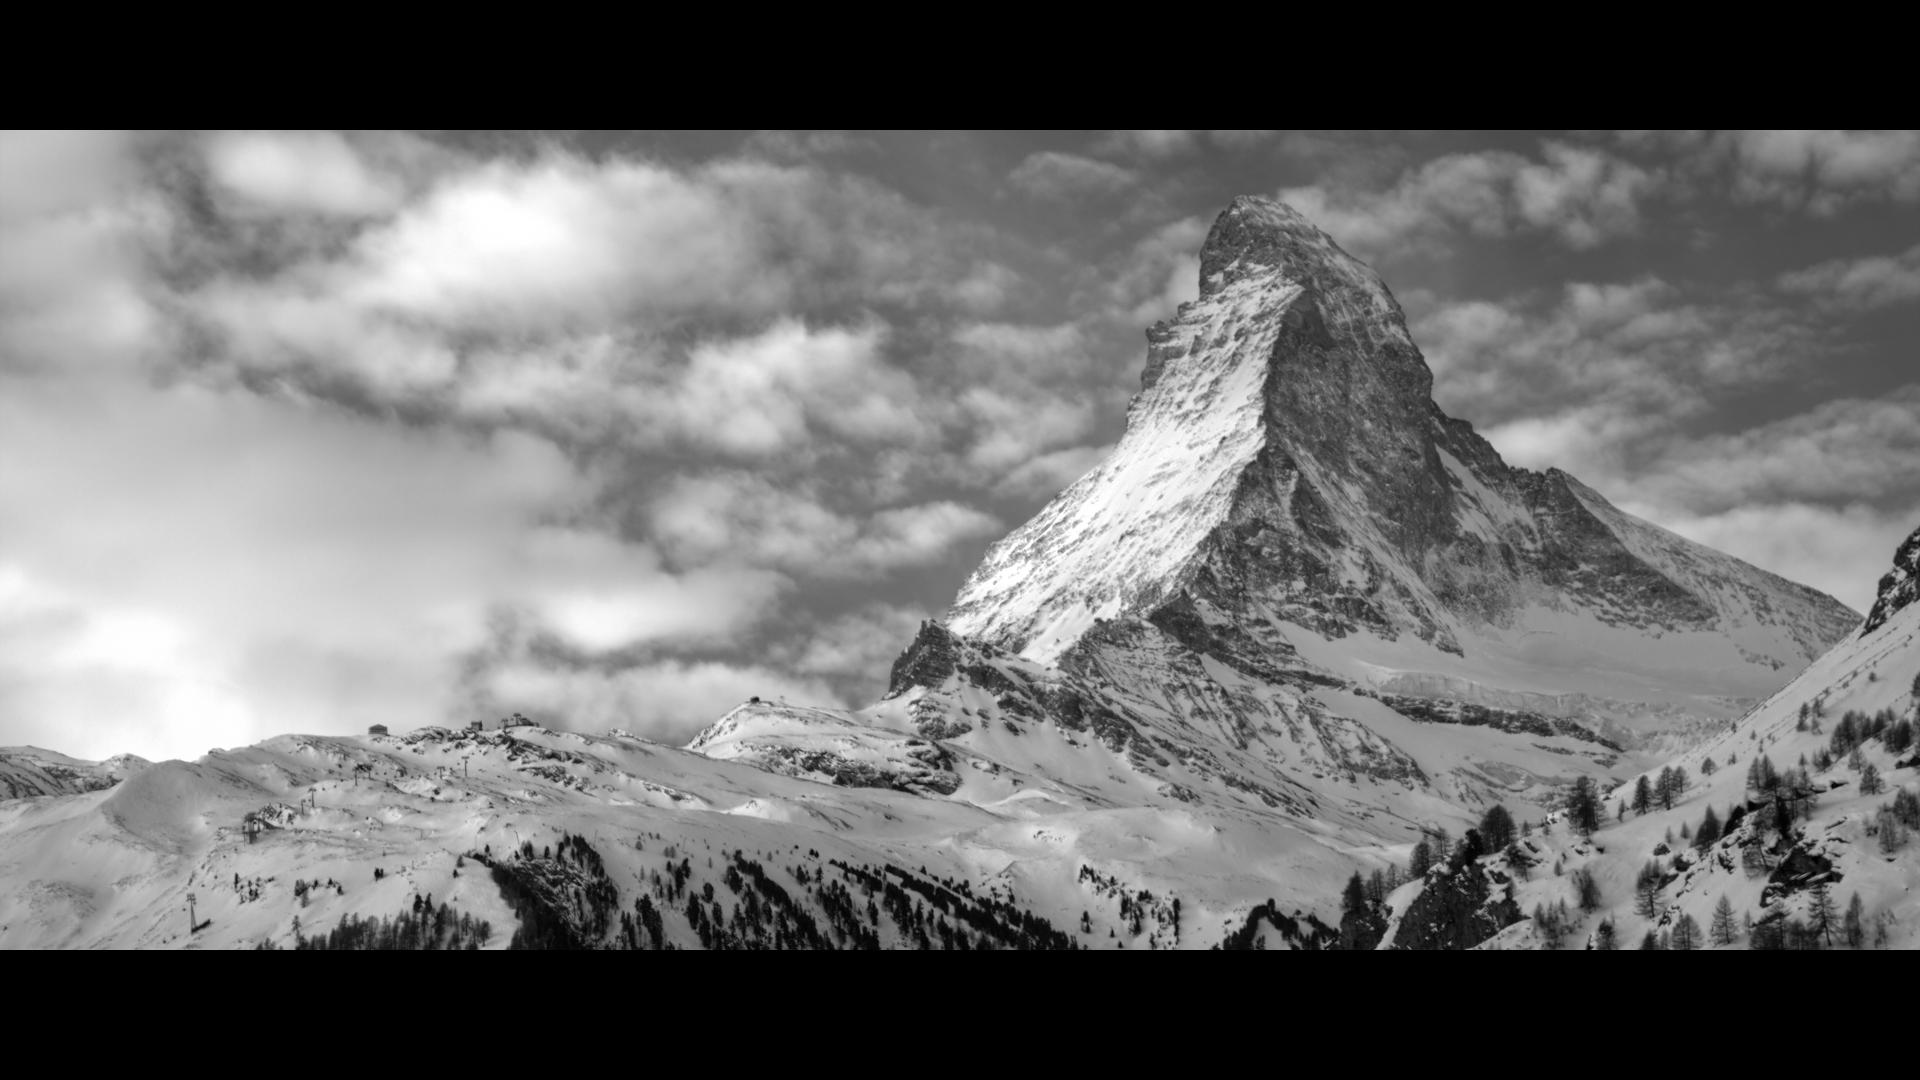 General 1920x1080 monochrome mountains winter snow Matterhorn Switzerland landscape